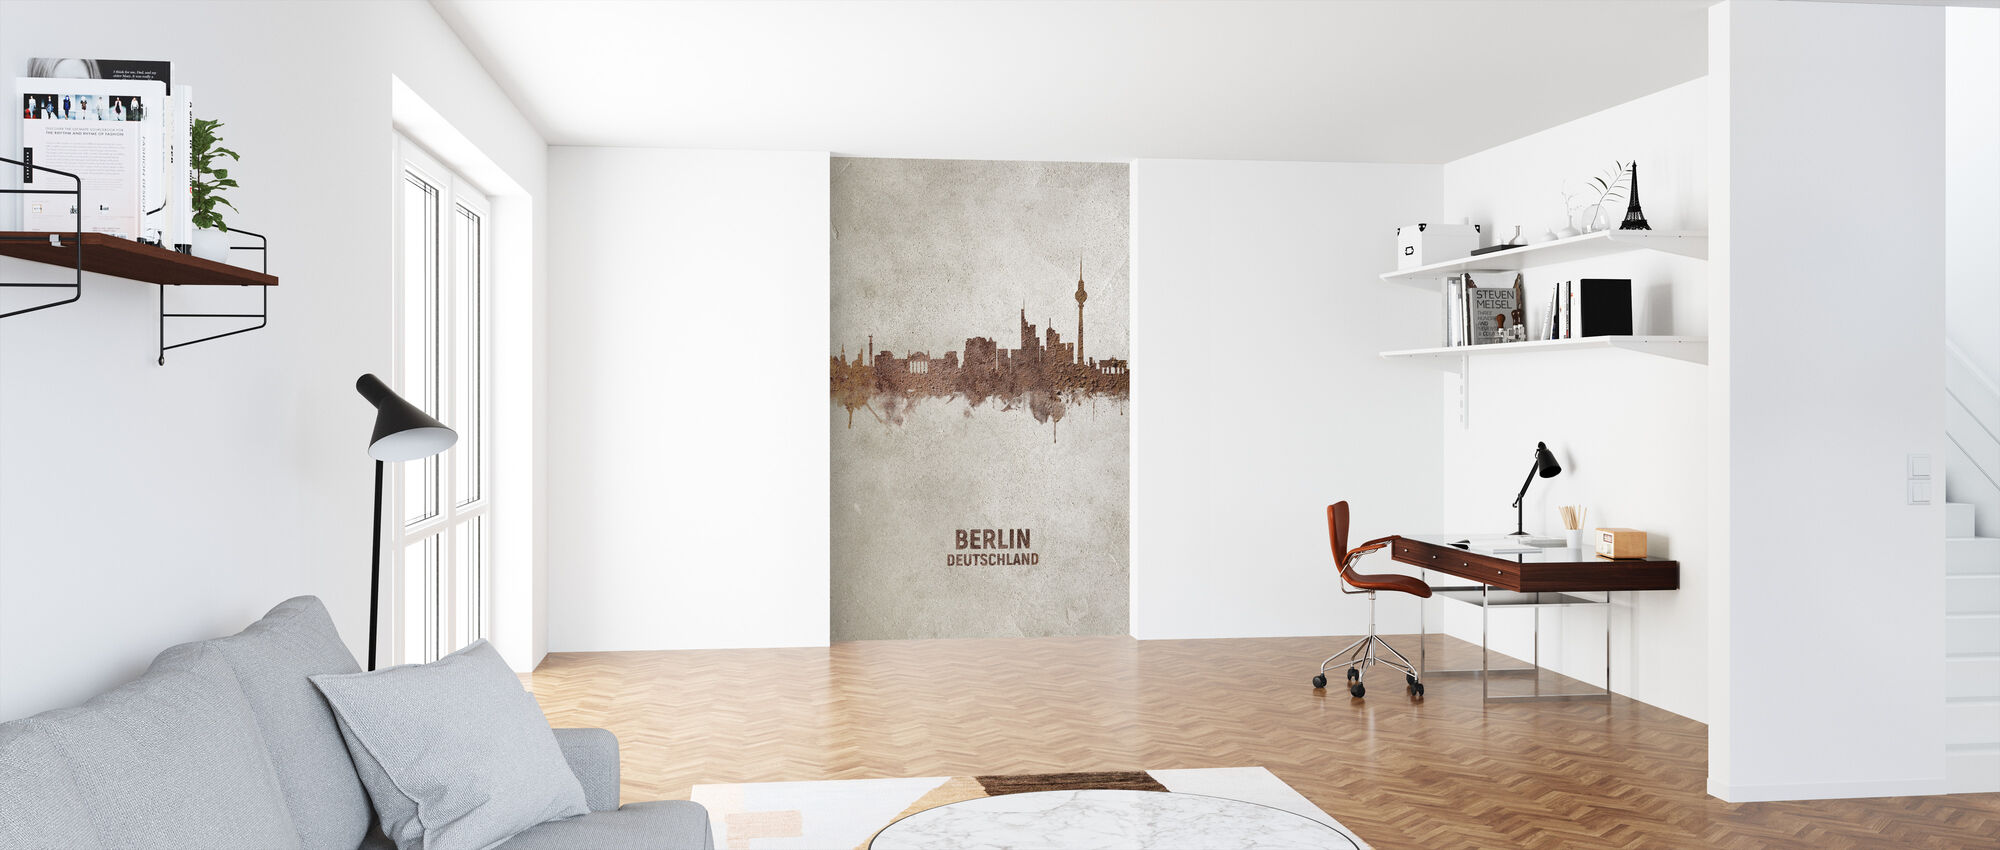 Berlin Tyskland Rust Skyline - Tapet - Kontor